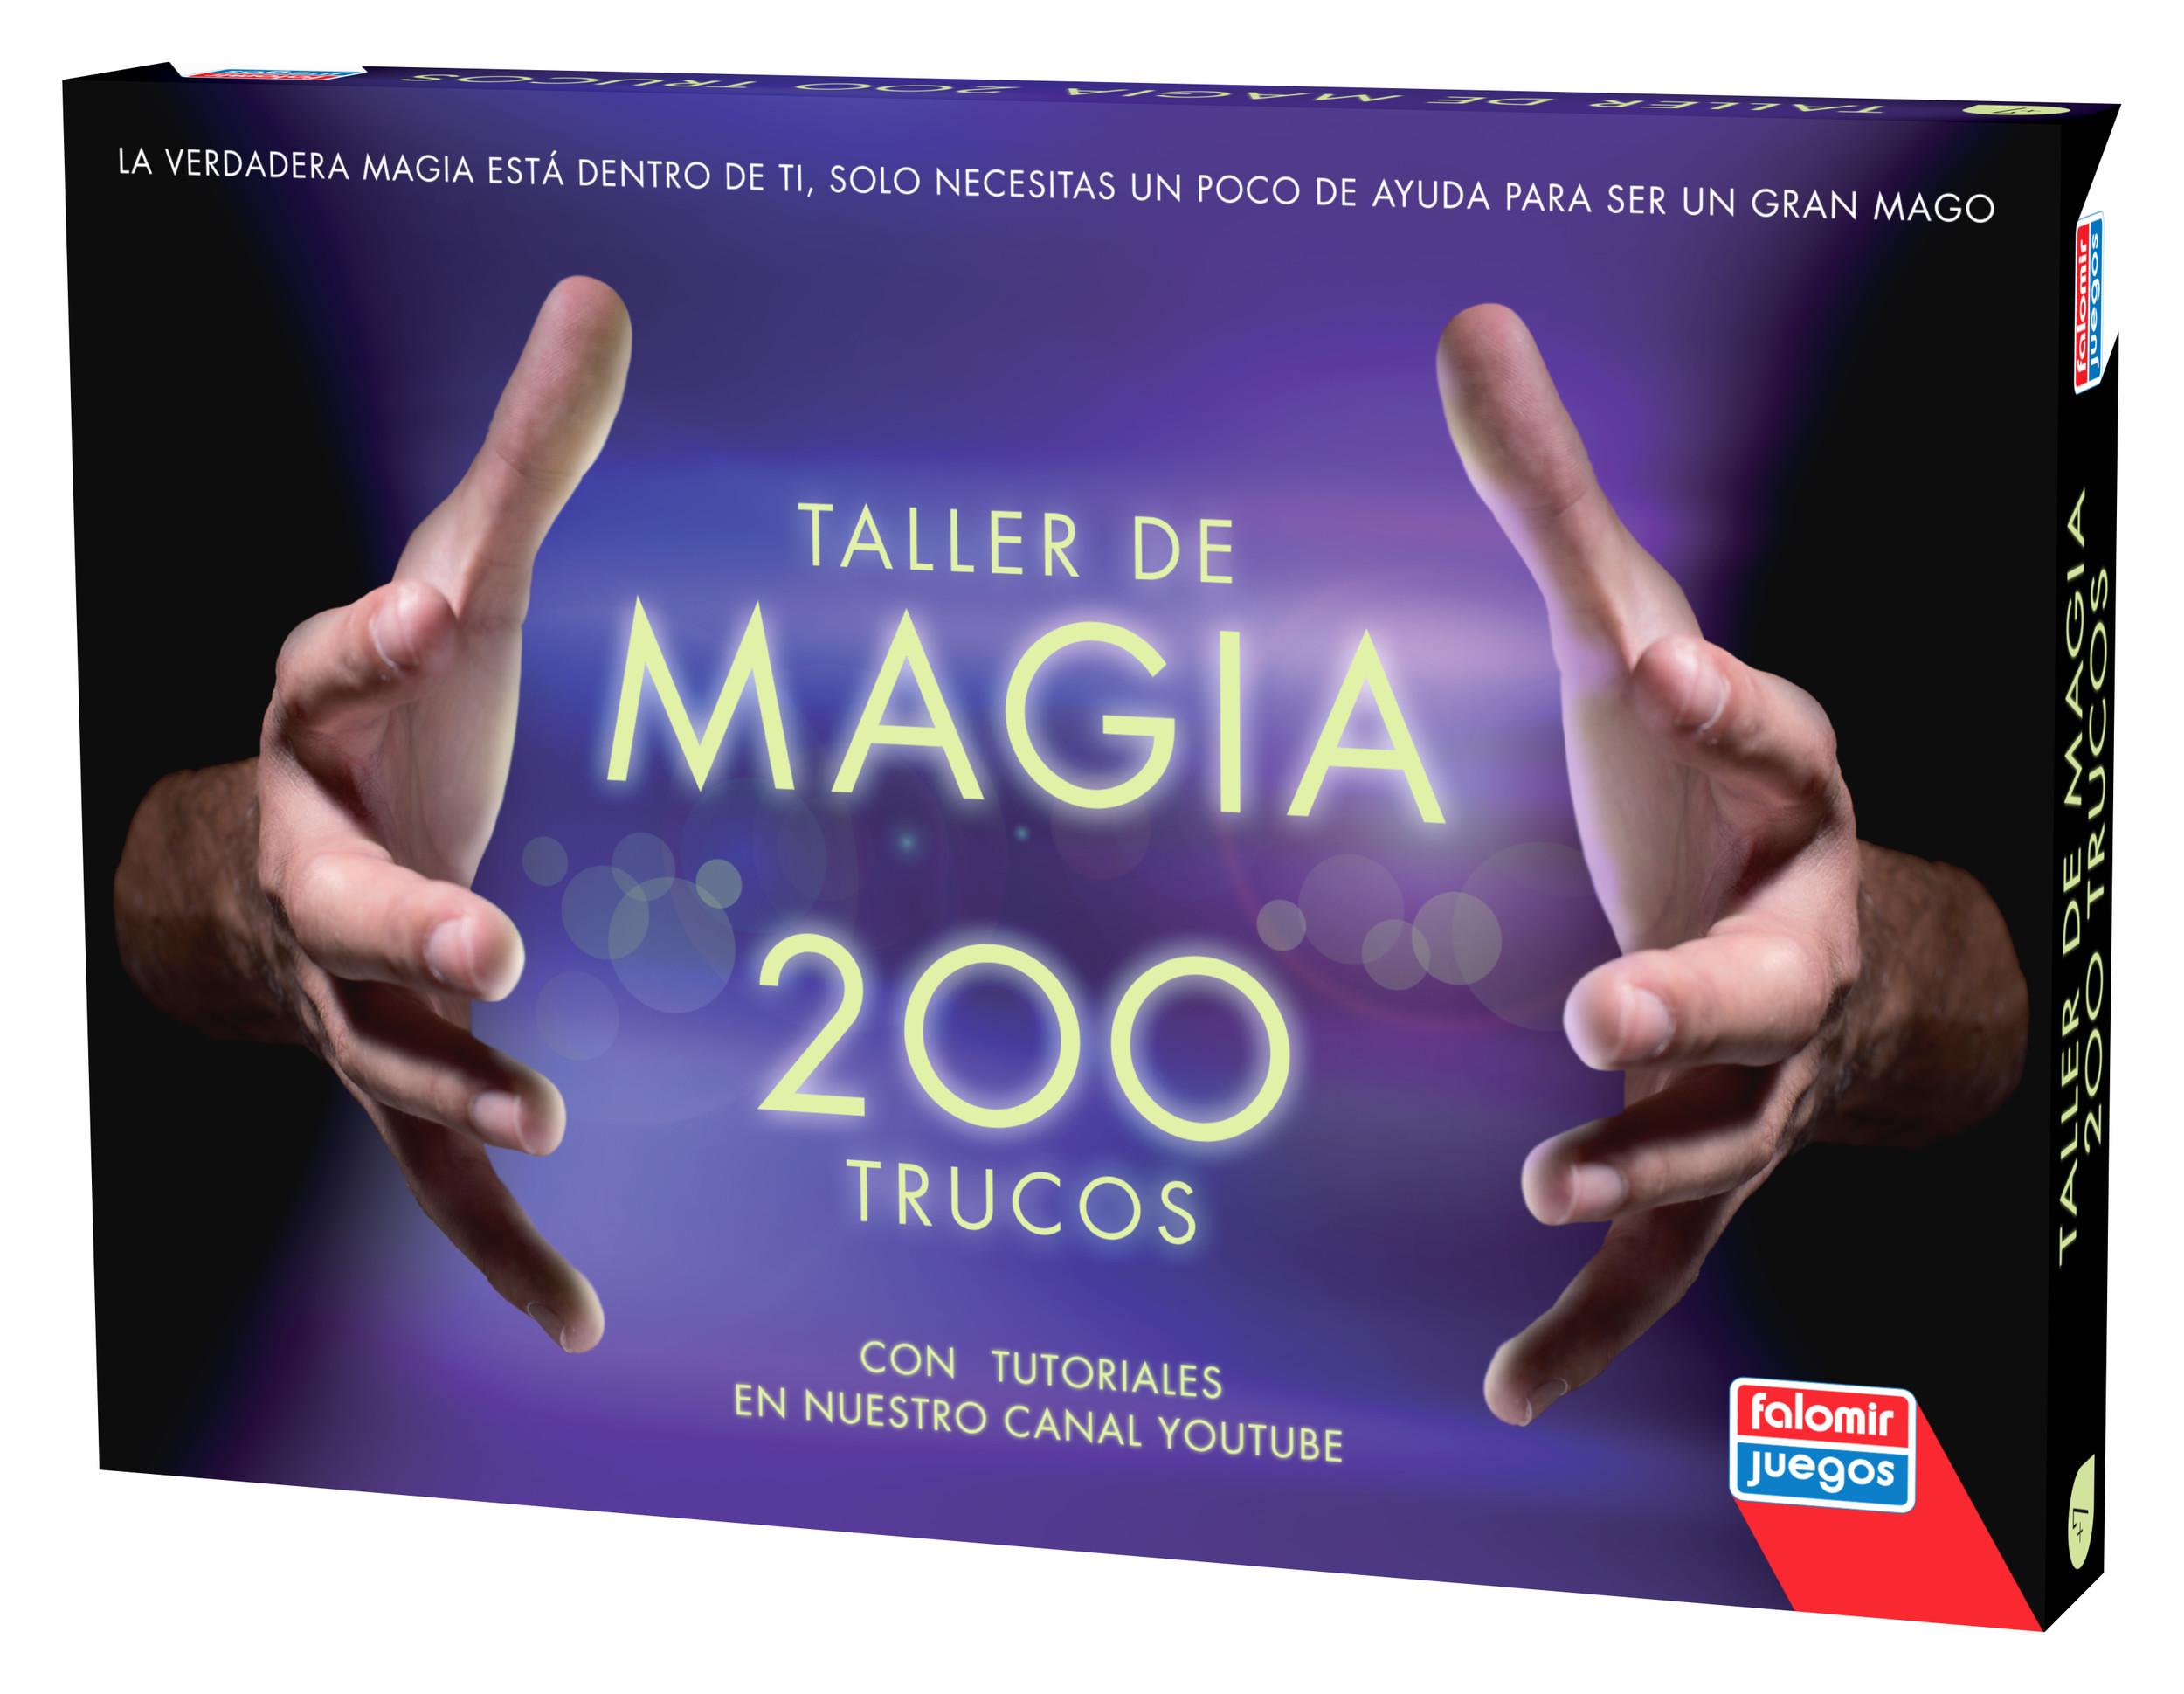 CAJA MAGIA 200 TRUCOS 1160 - N33720